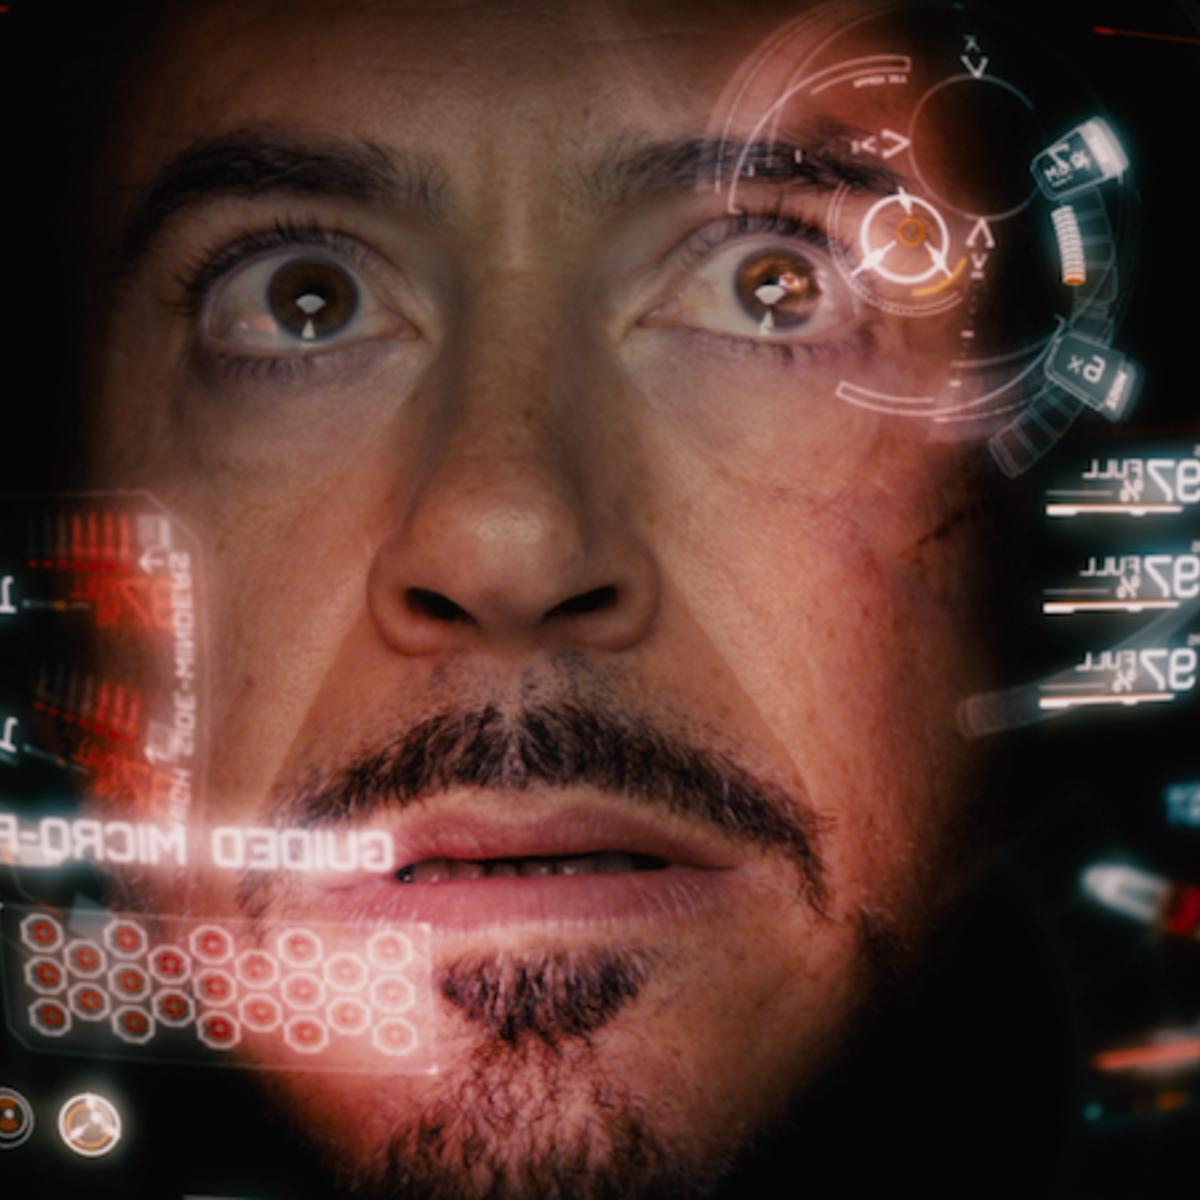 Iron_Man_Mark_VII_HUD_design_By_Jayse_Hansen_1400.png